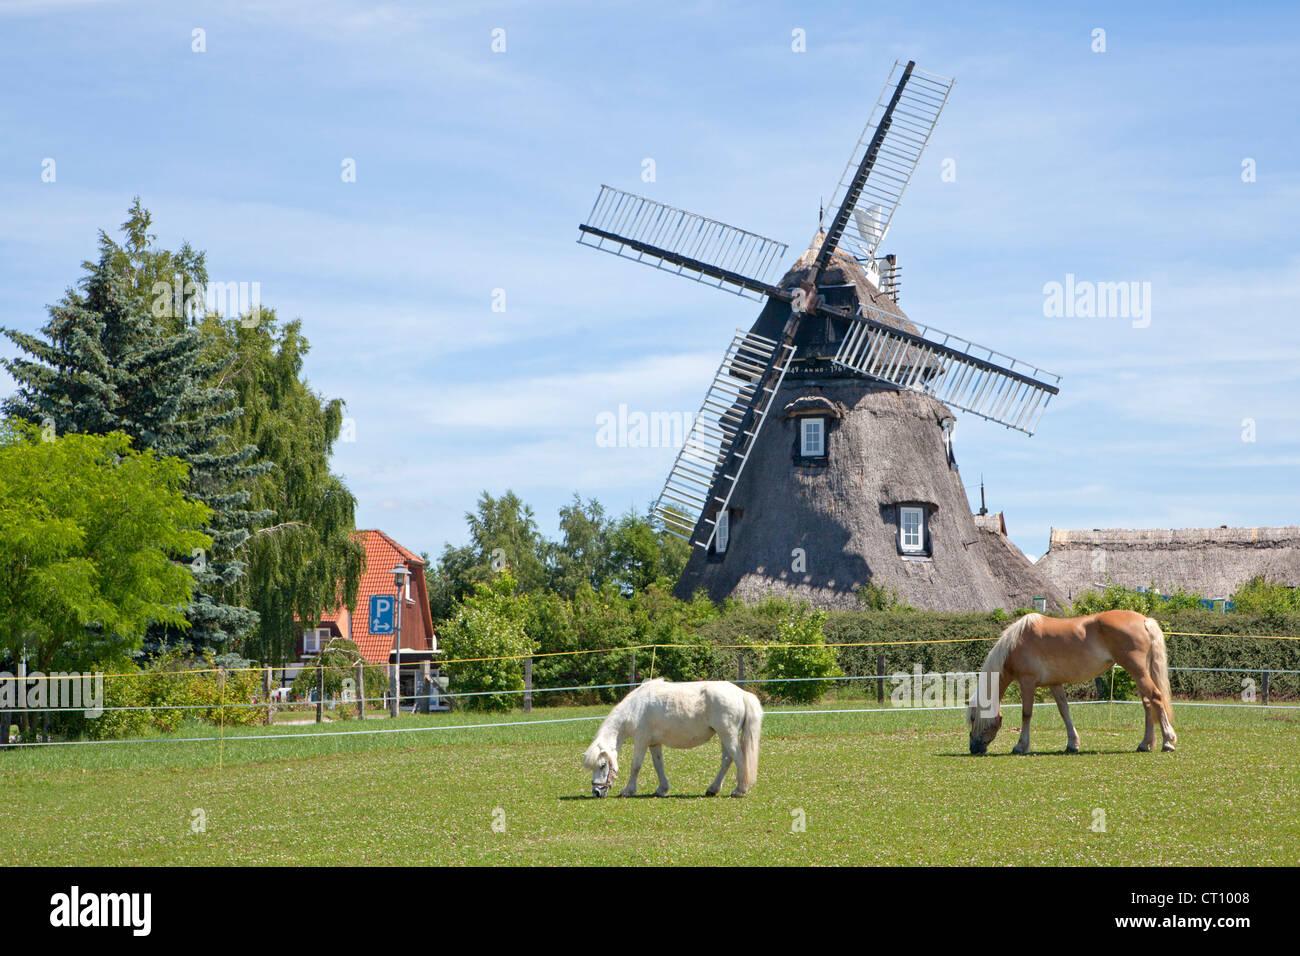 ponies in front of windmill, Mecklenburg Village near Wismar, Mecklenburg-West Pomerania, Germany - Stock Image